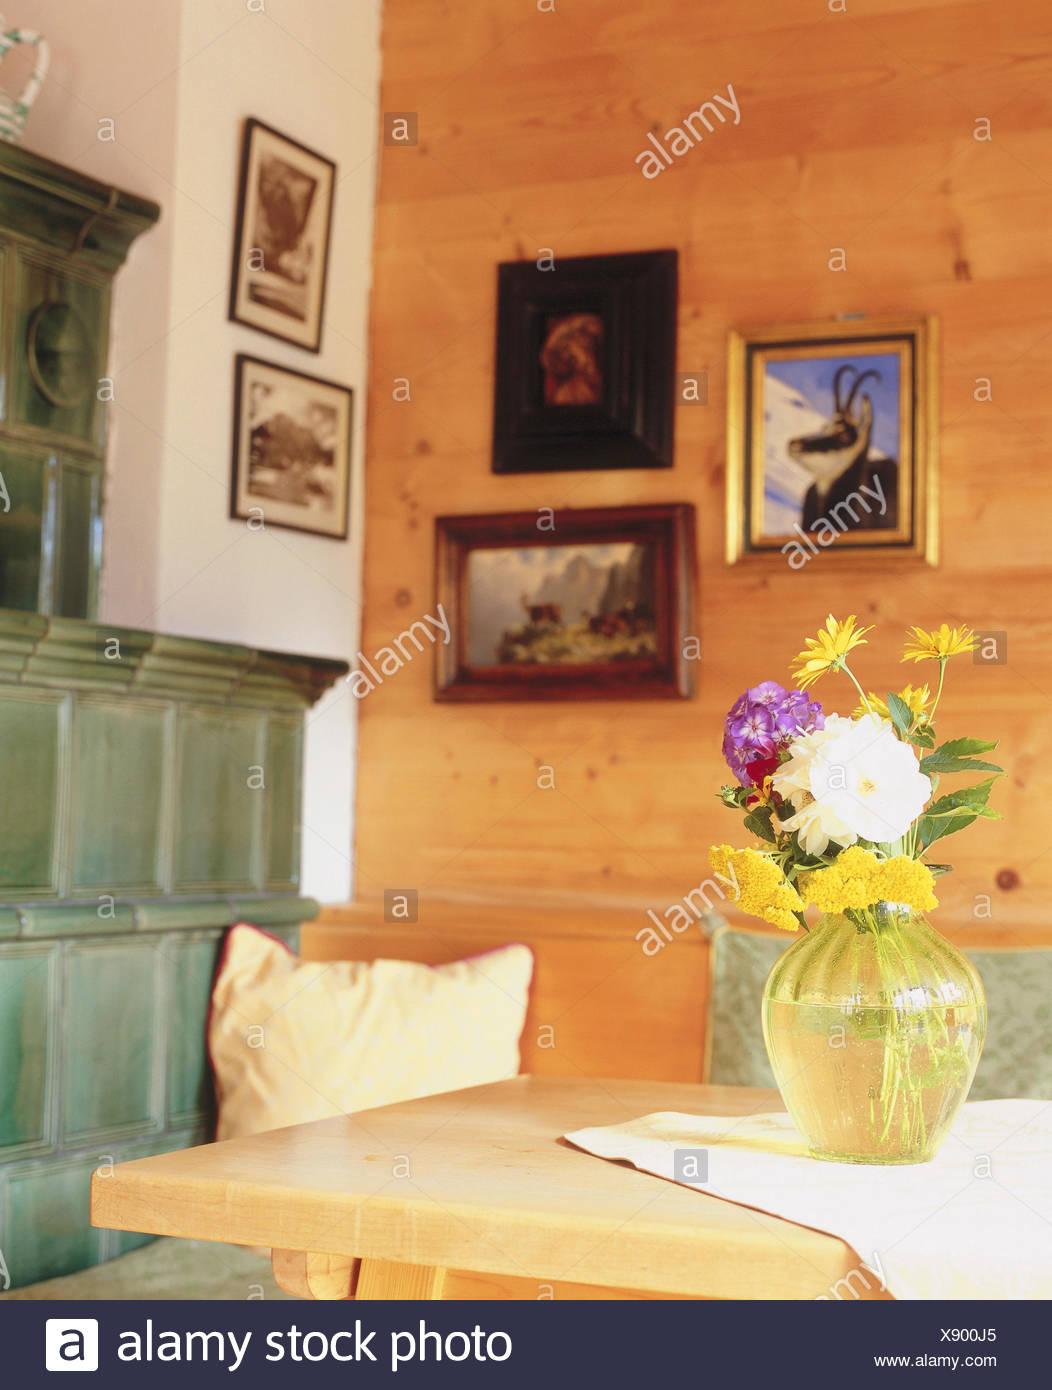 wohnraum kachelofen detail zimmer bauernstube kuche wohnraum essecke eckbank esstisch holzteil mobel st mobel wand wandbelag wande aus holz